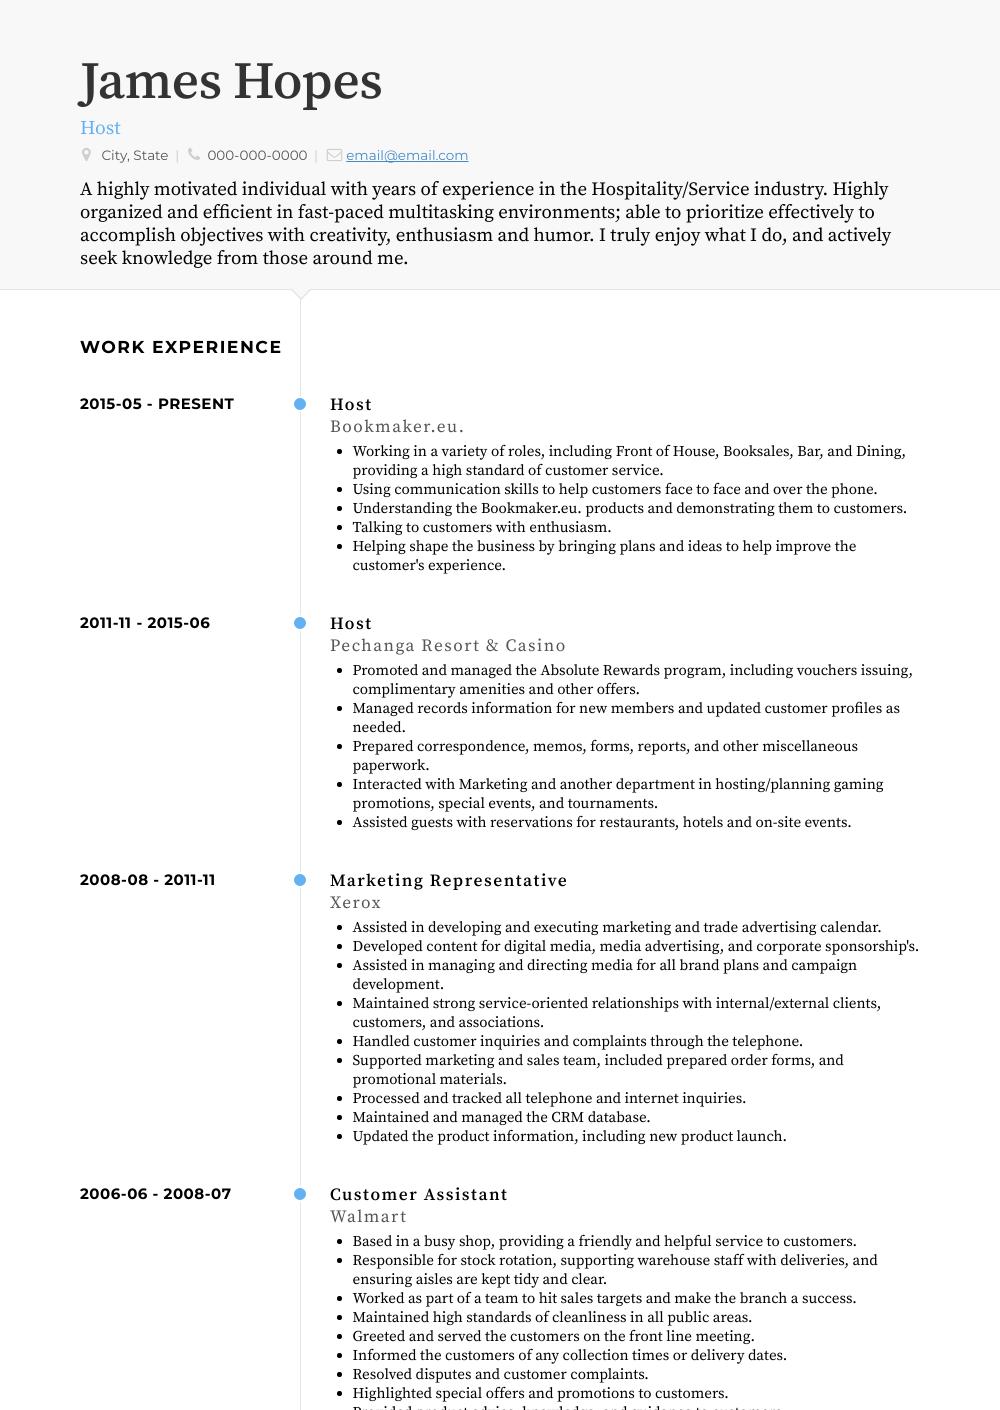 Host  Resume Samples  Templates  VisualCV